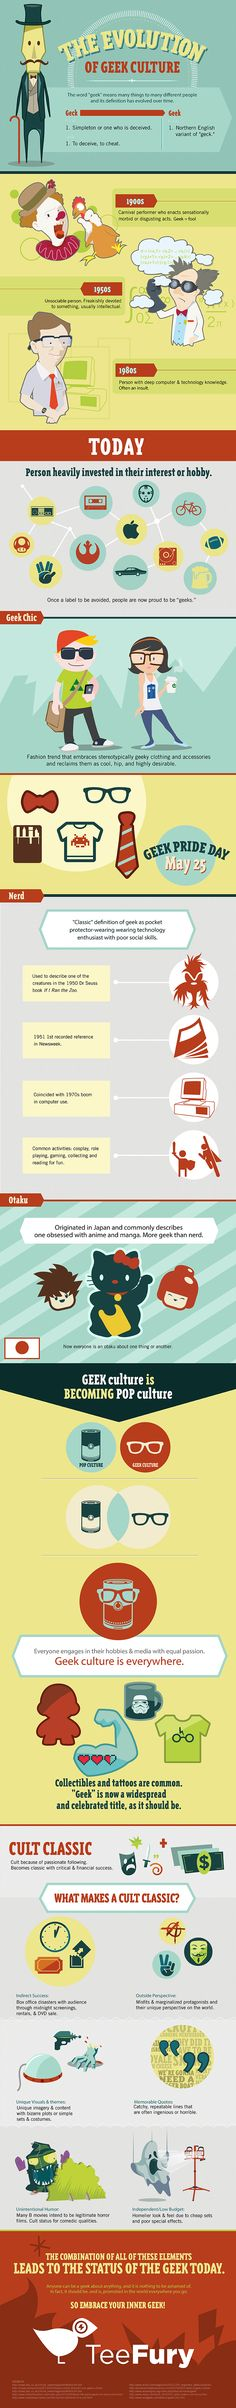 The Evolution of Geek Culture - Geek History Past & Present | TeeFury